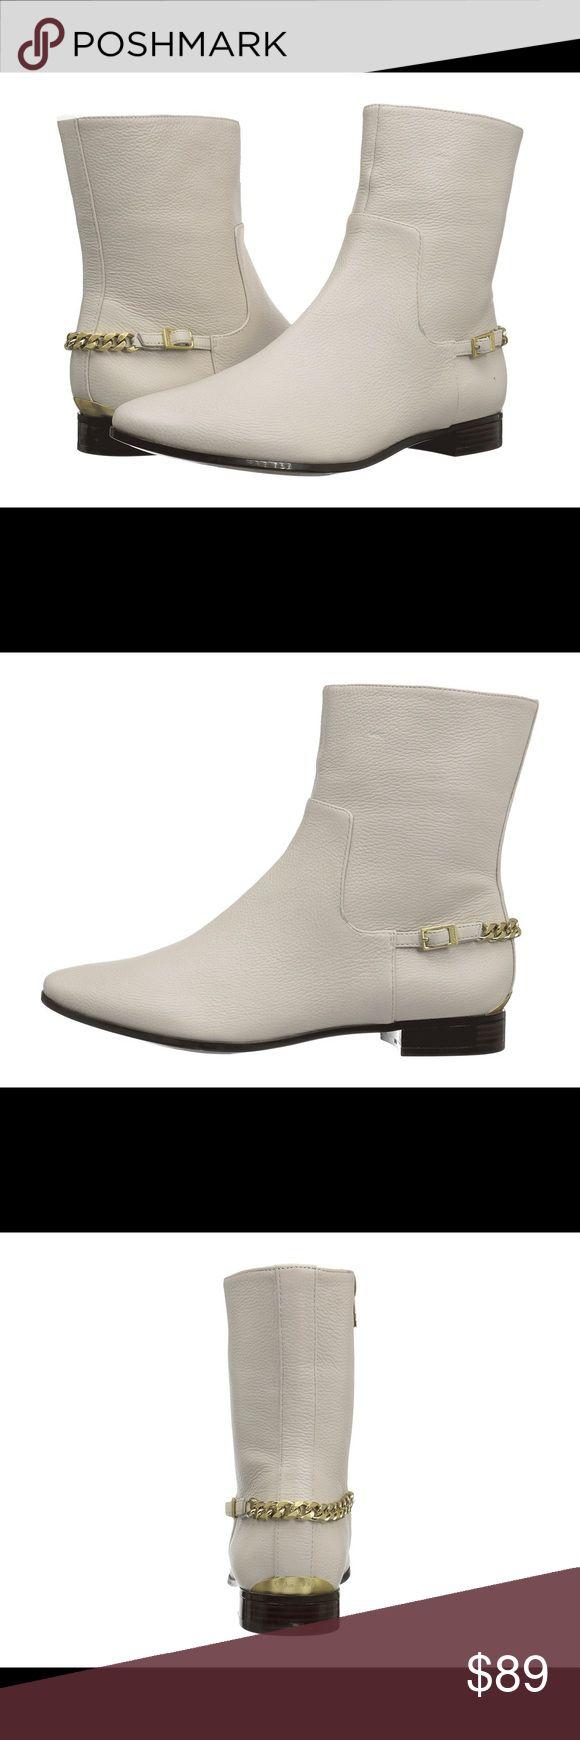 Brand New Calvin Klein Ankle Bottie Stunning  genuine leather soft white ankle bottie. Brand new in original box. Calvin Klein Shoes Ankle Boots & Booties